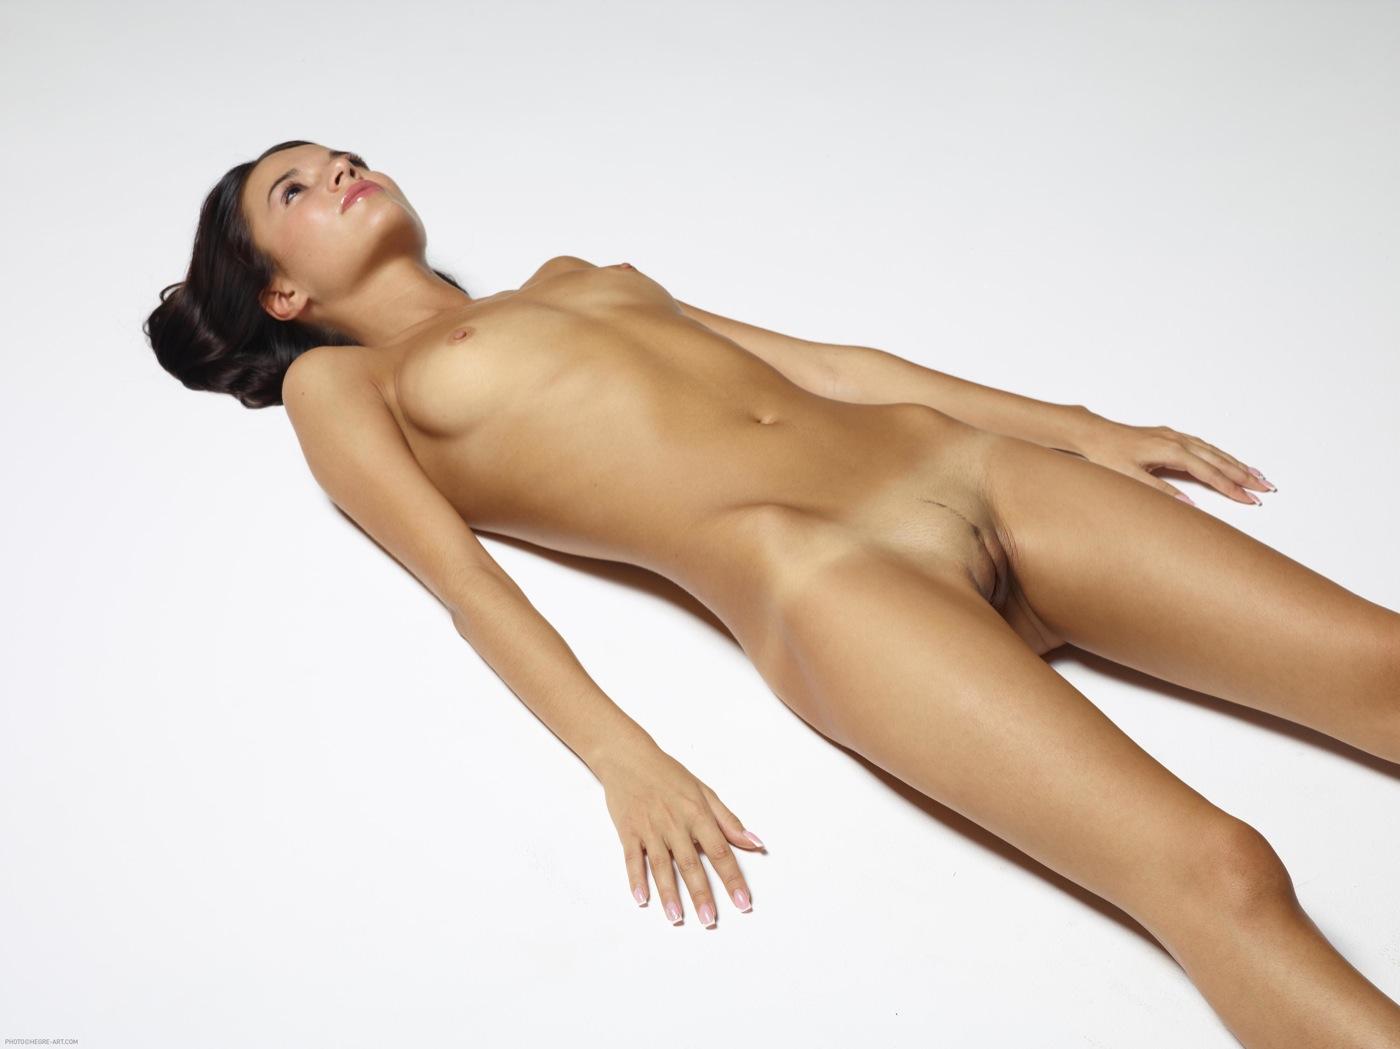 Turboimagehost Nude Lso Hd Porn Pics